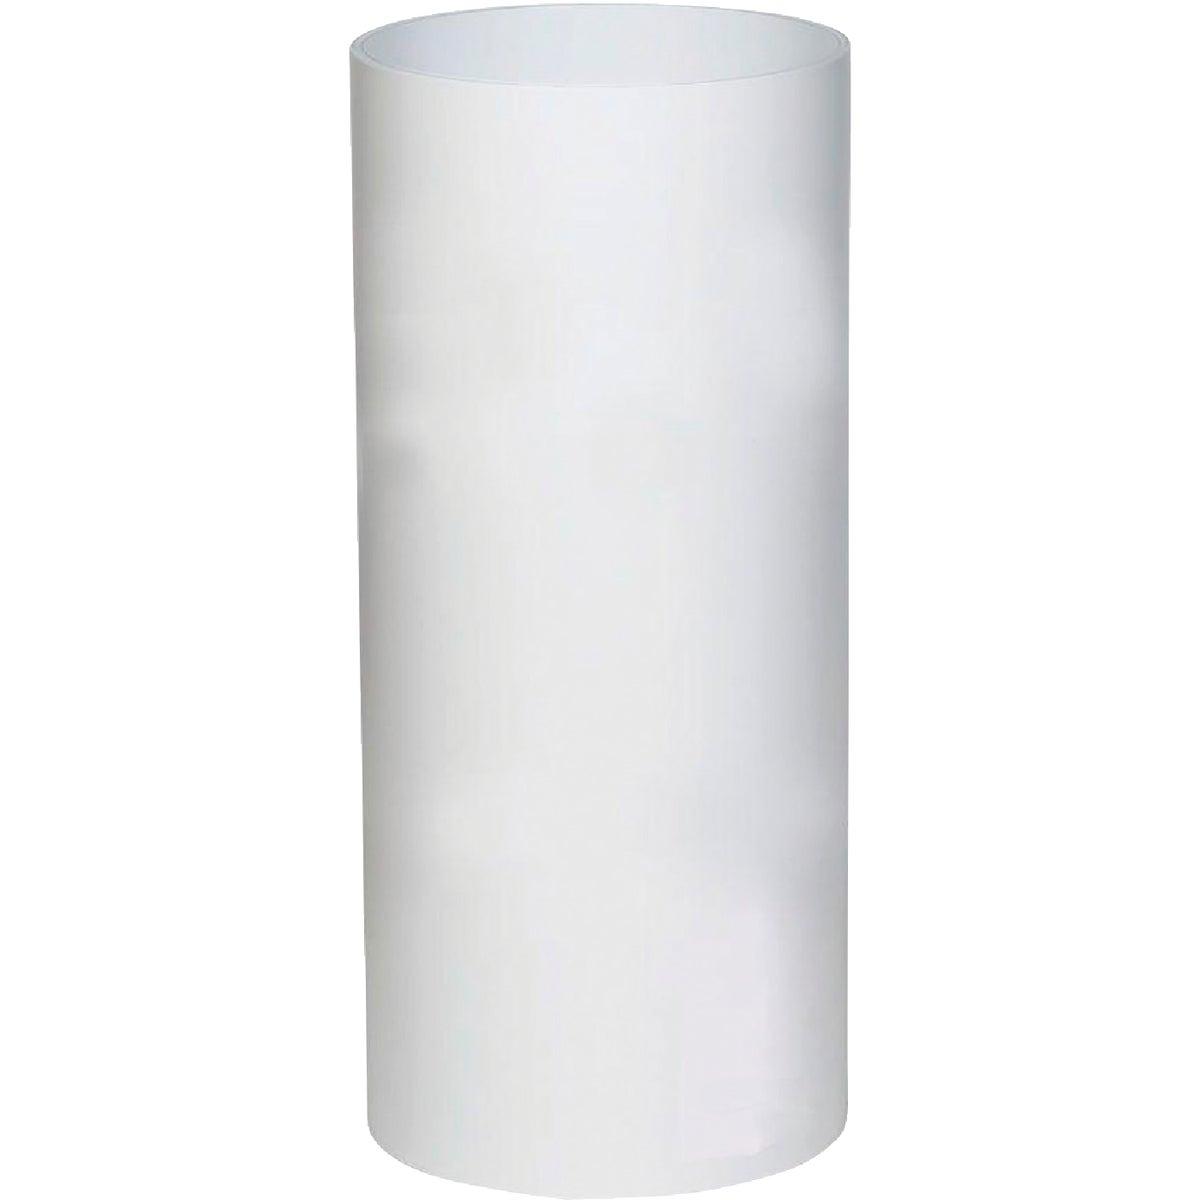 Amerimax Home Products 69124182 Aluminum Trim Coil, 24